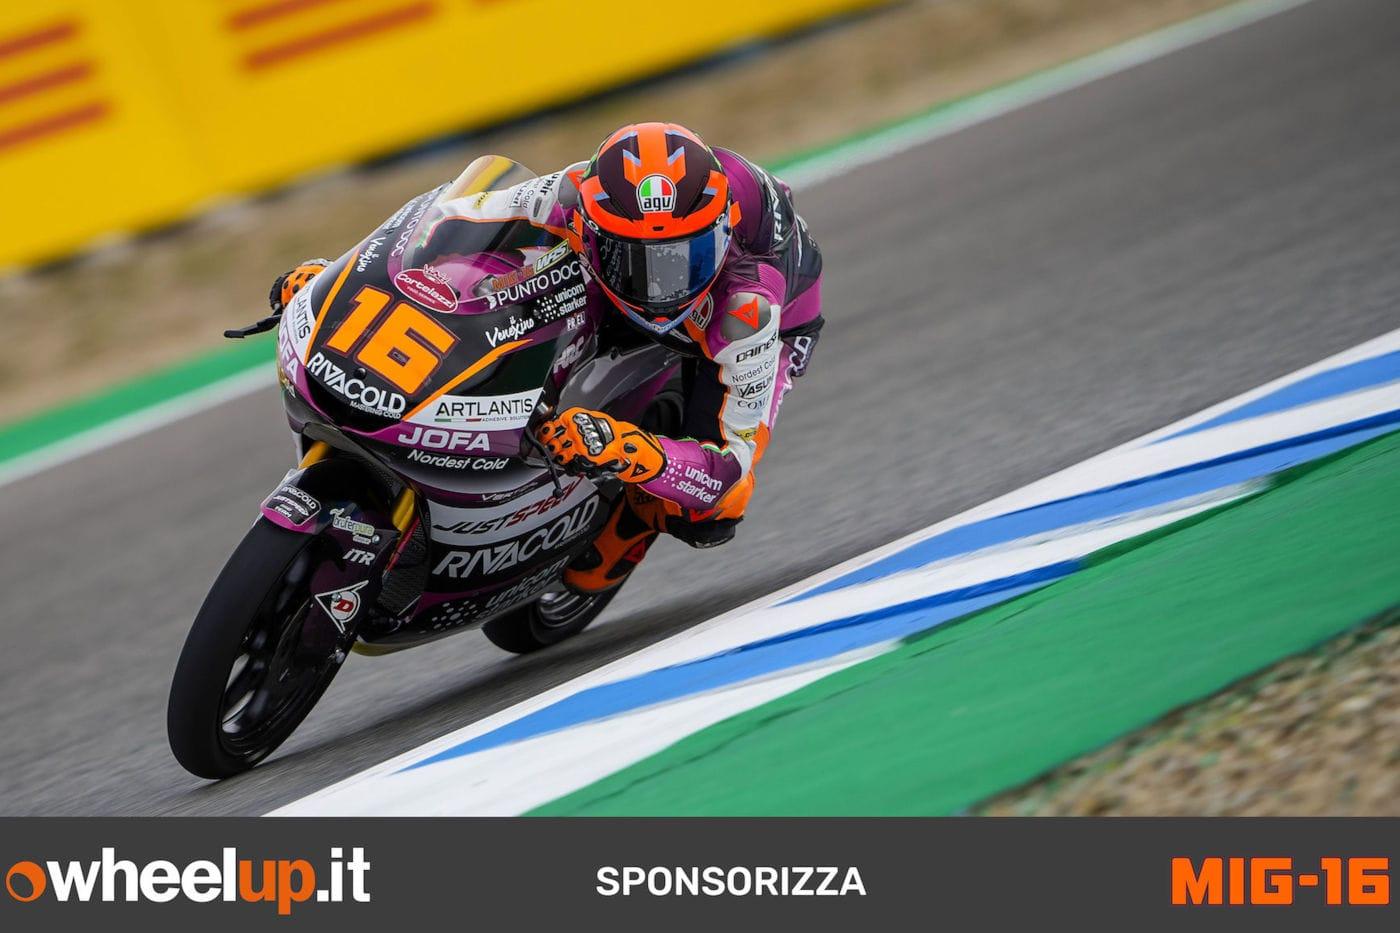 Wheelup sponsor Andrea Migno